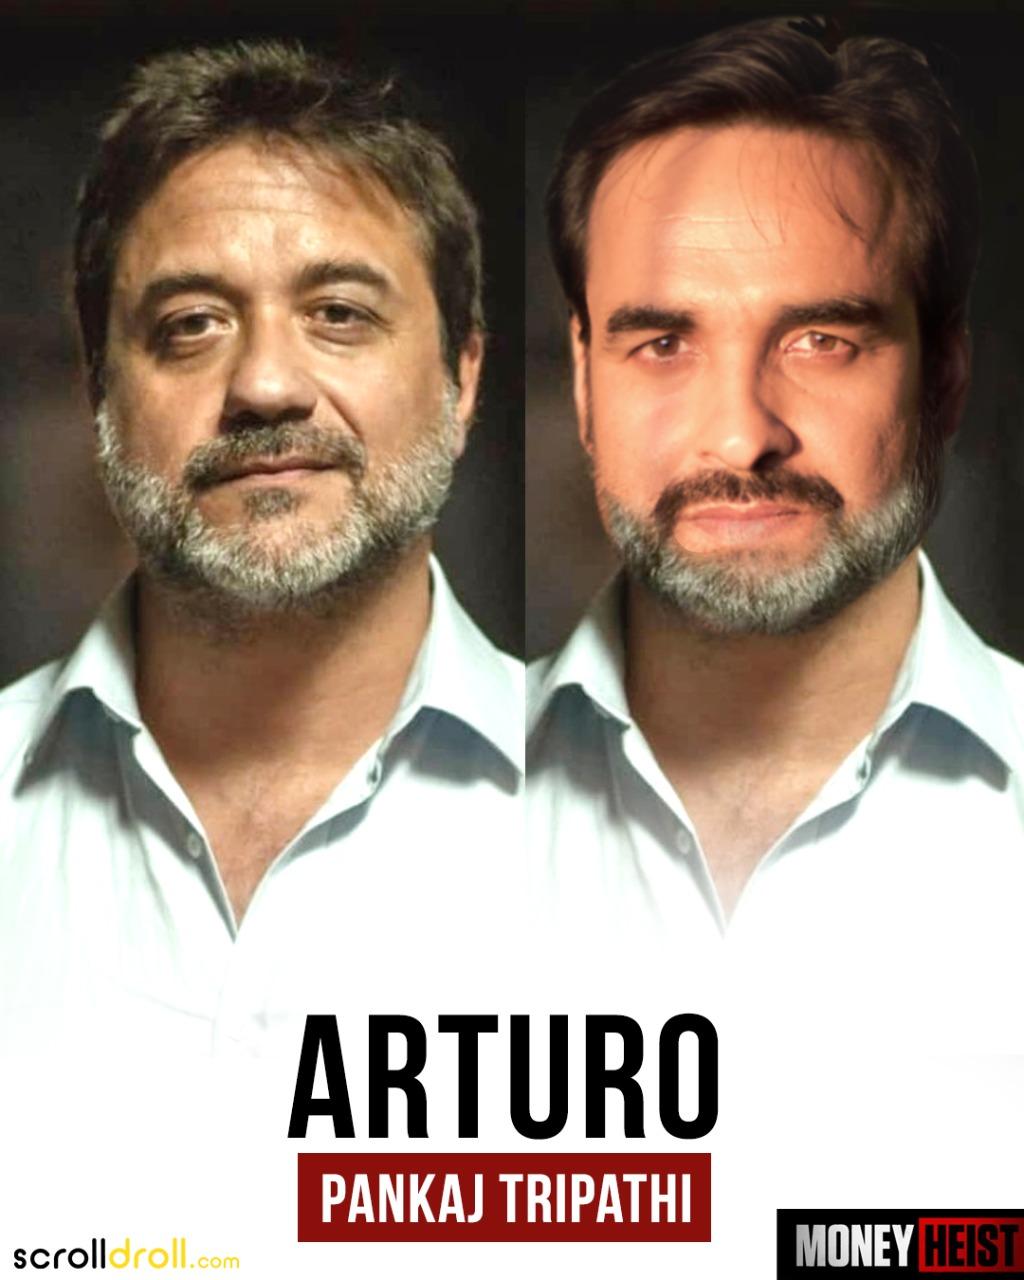 Money-Heist-With-A-Bollywood-Cast-Arturo